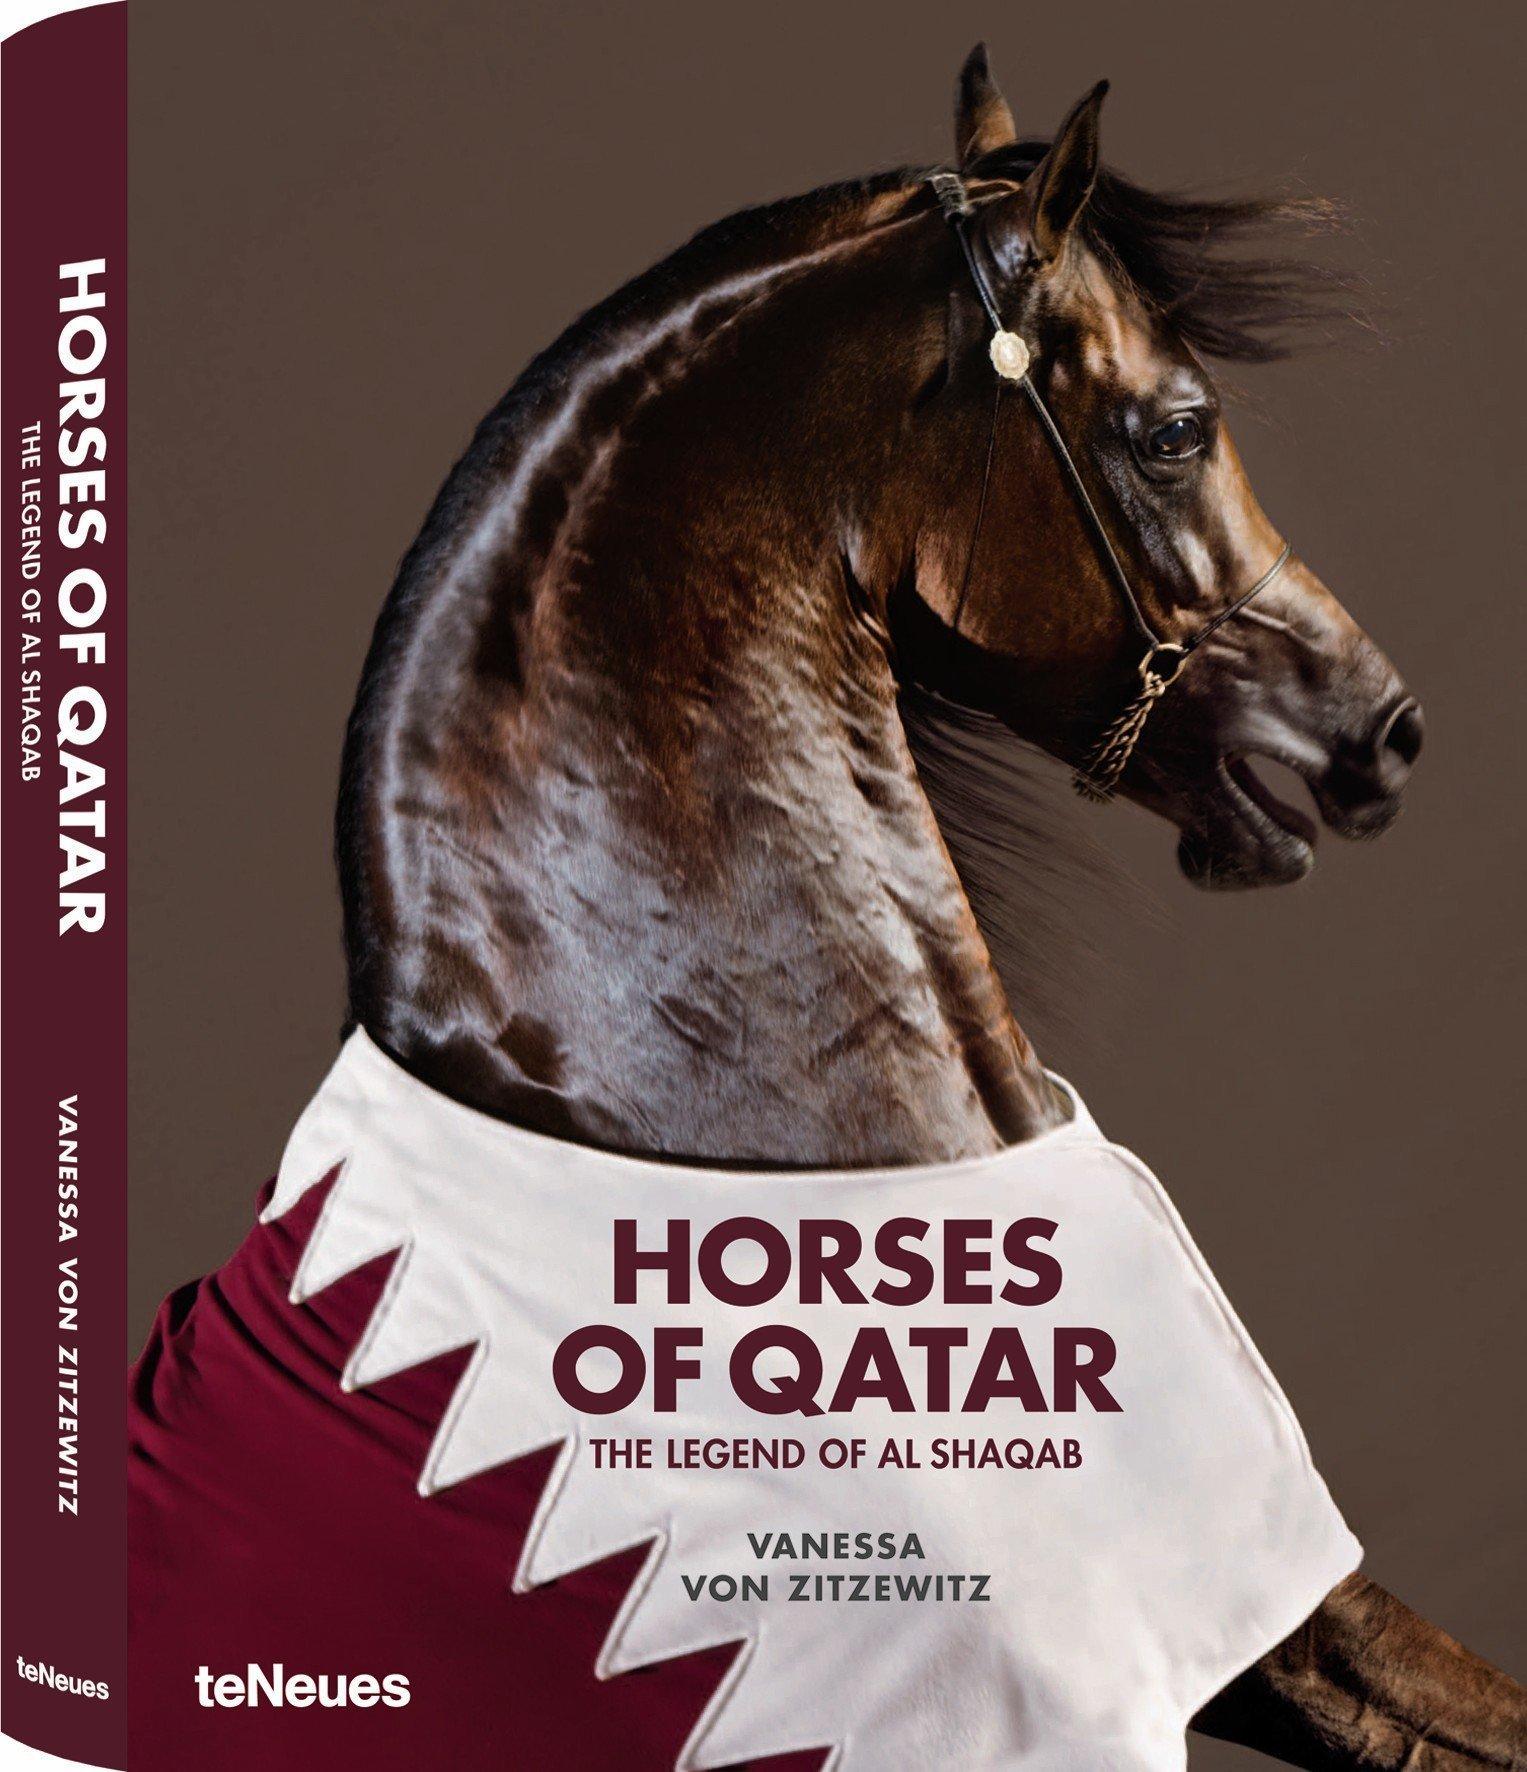 Horses of Qatar